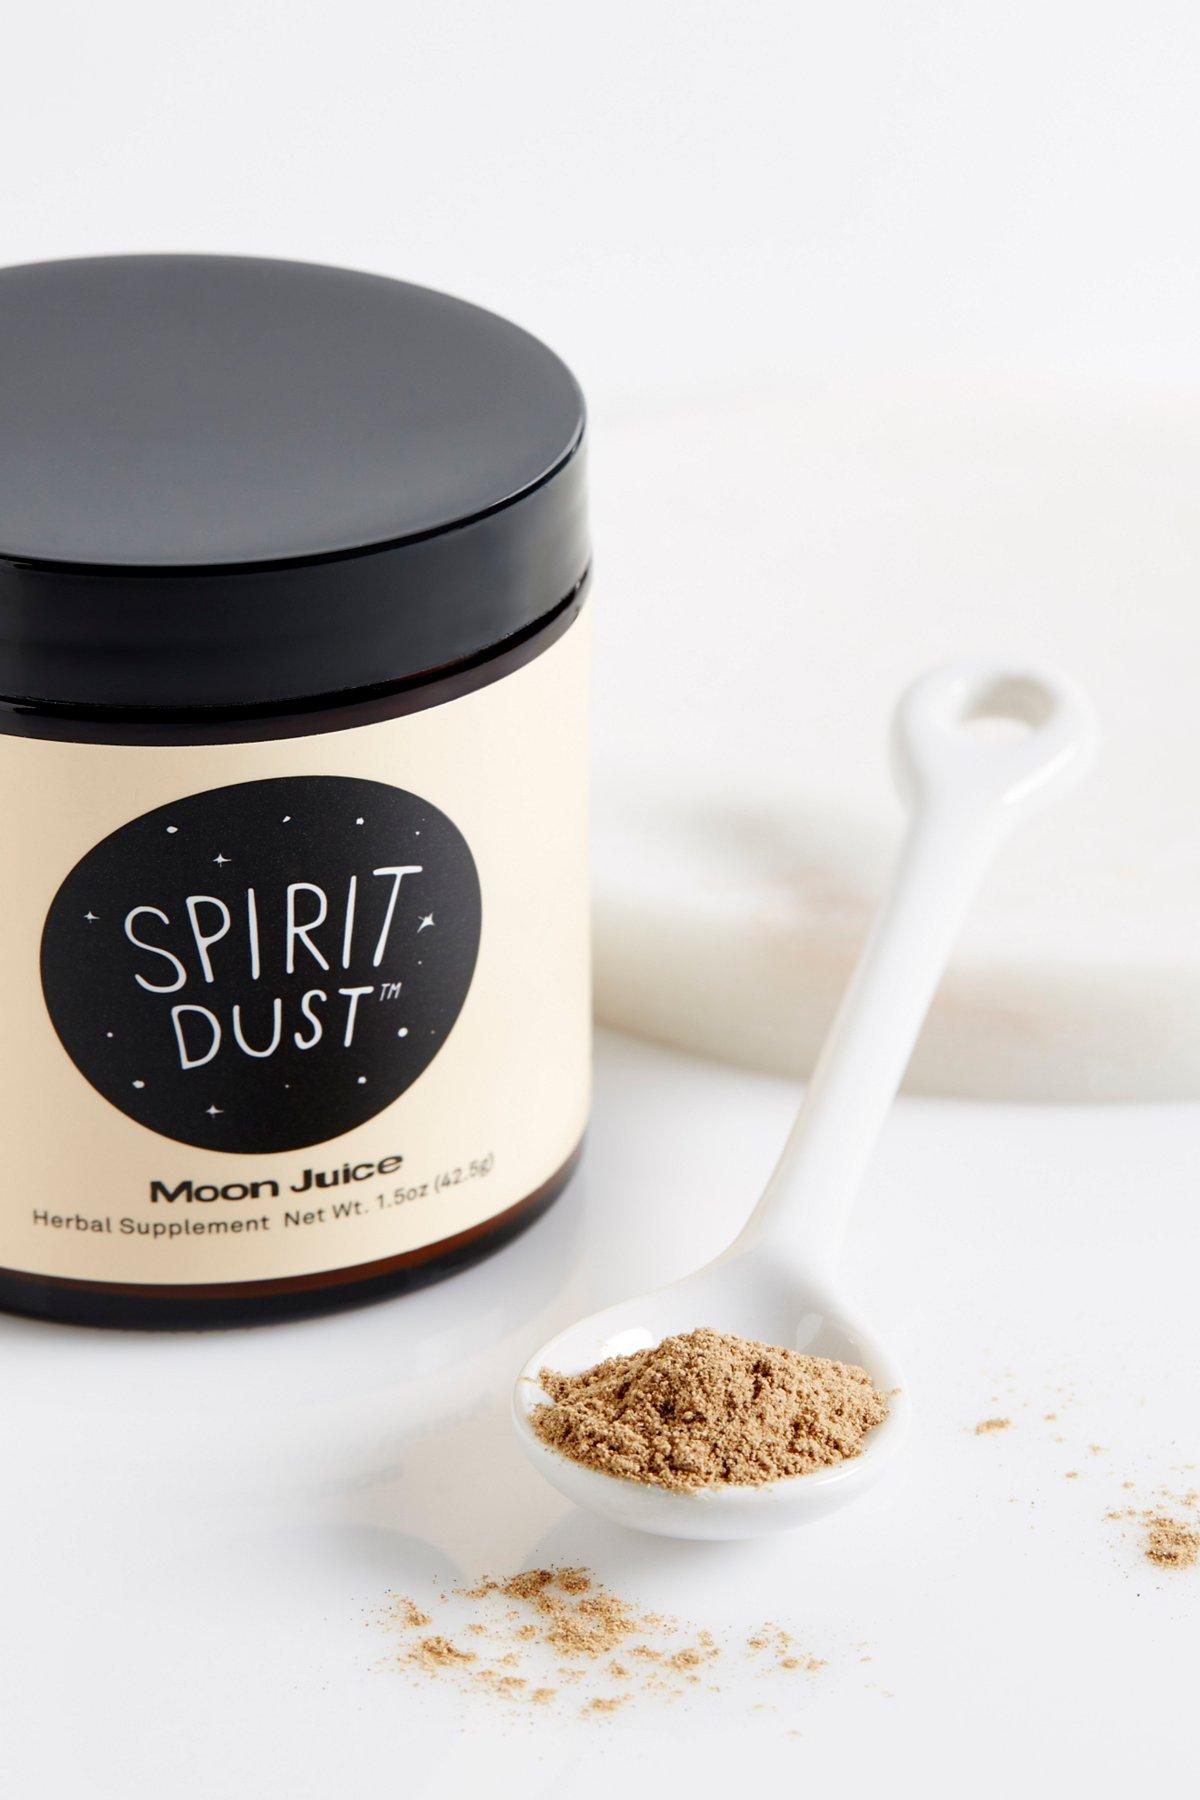 Moon Juice出品的Spirit Dust益智营养粉